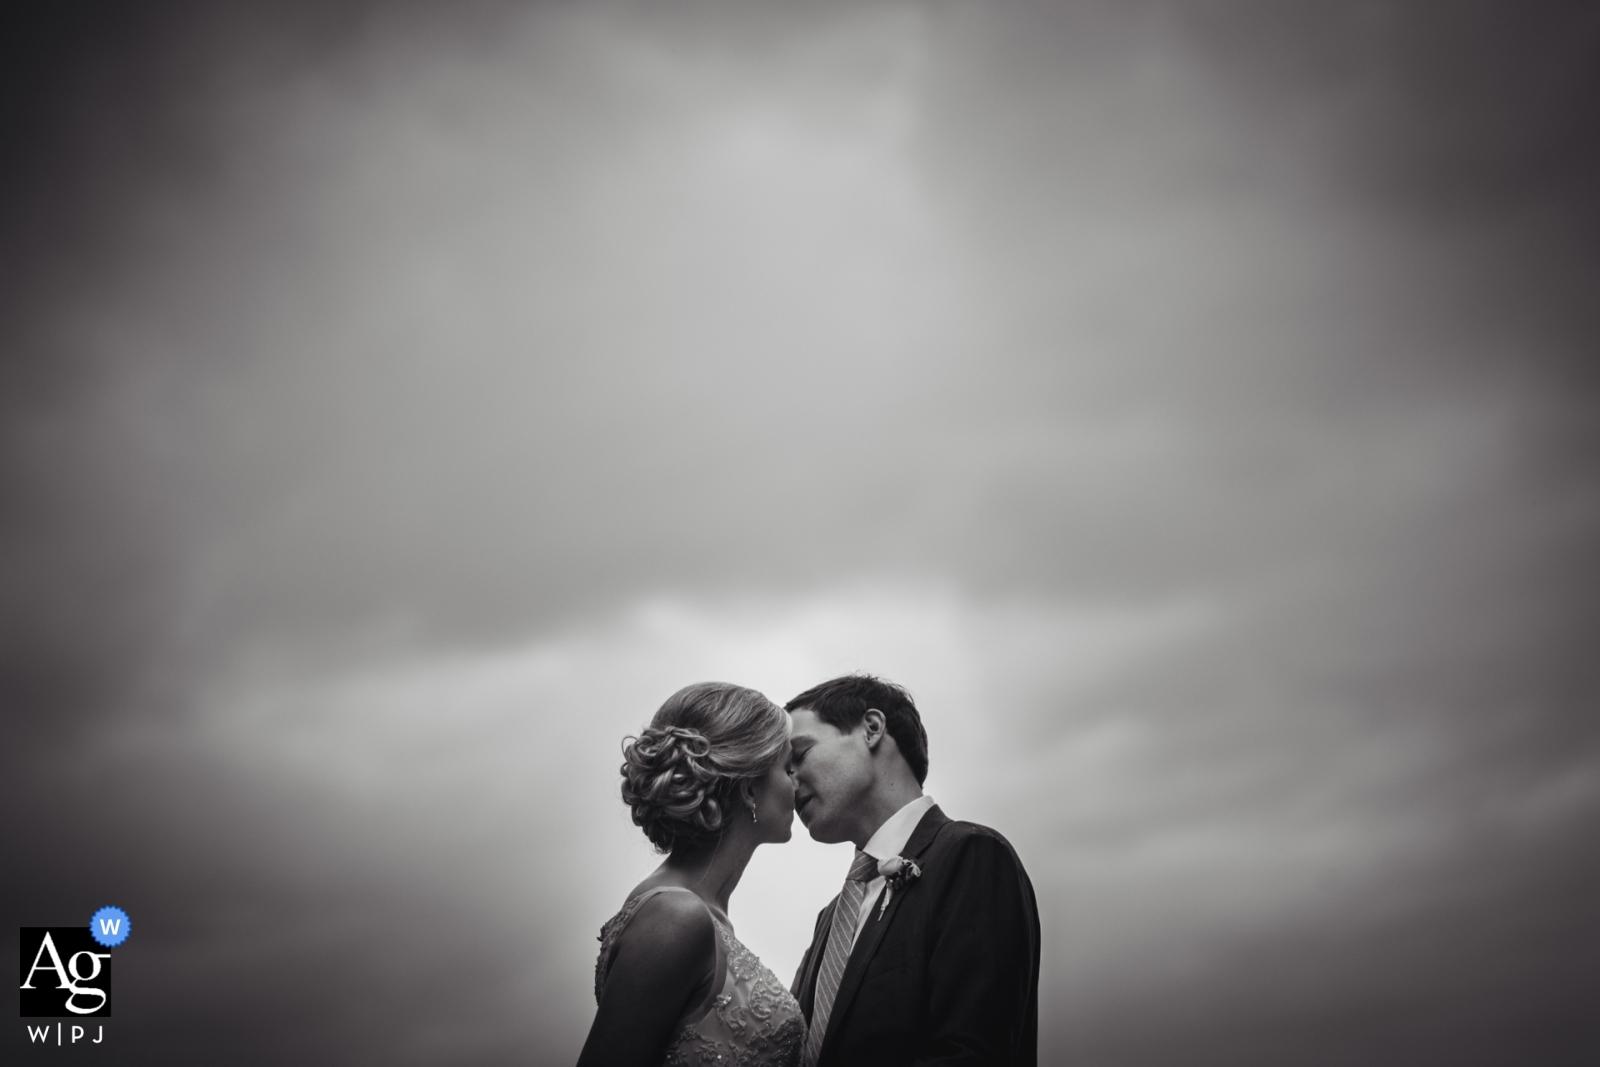 AGWPJA Wedding Photography Award Marco Vegni Photographer